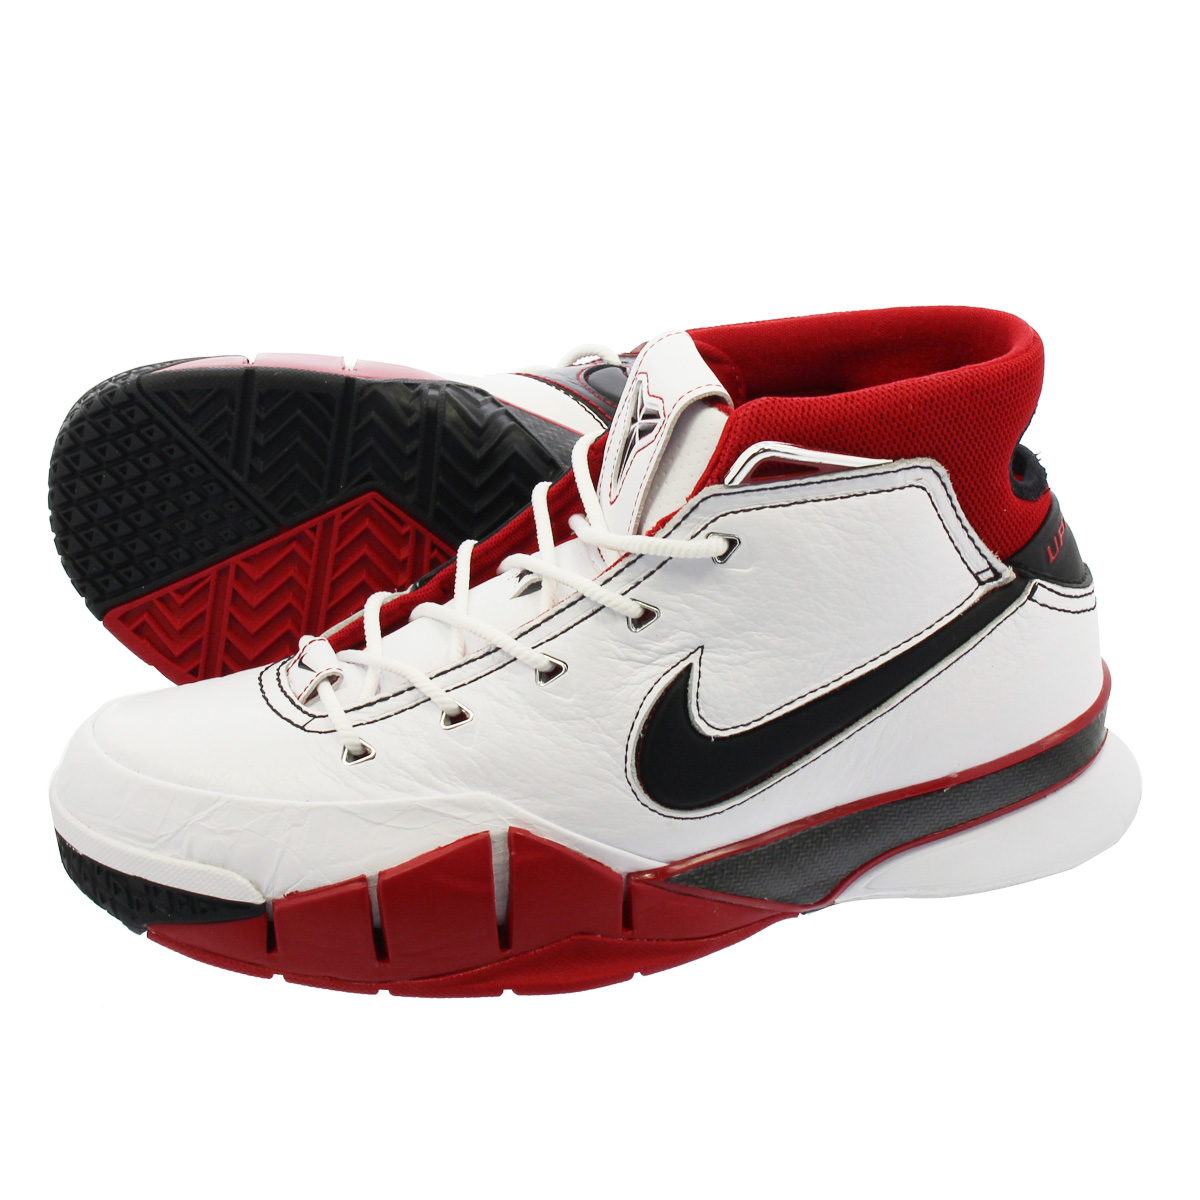 9e7ca84dee6 NIKE ZOOM KOBE 1 PROTRO Nike zoom Corby 1 professional fatty tuna WHITE  BLACK VARSITY RED aq2728-102